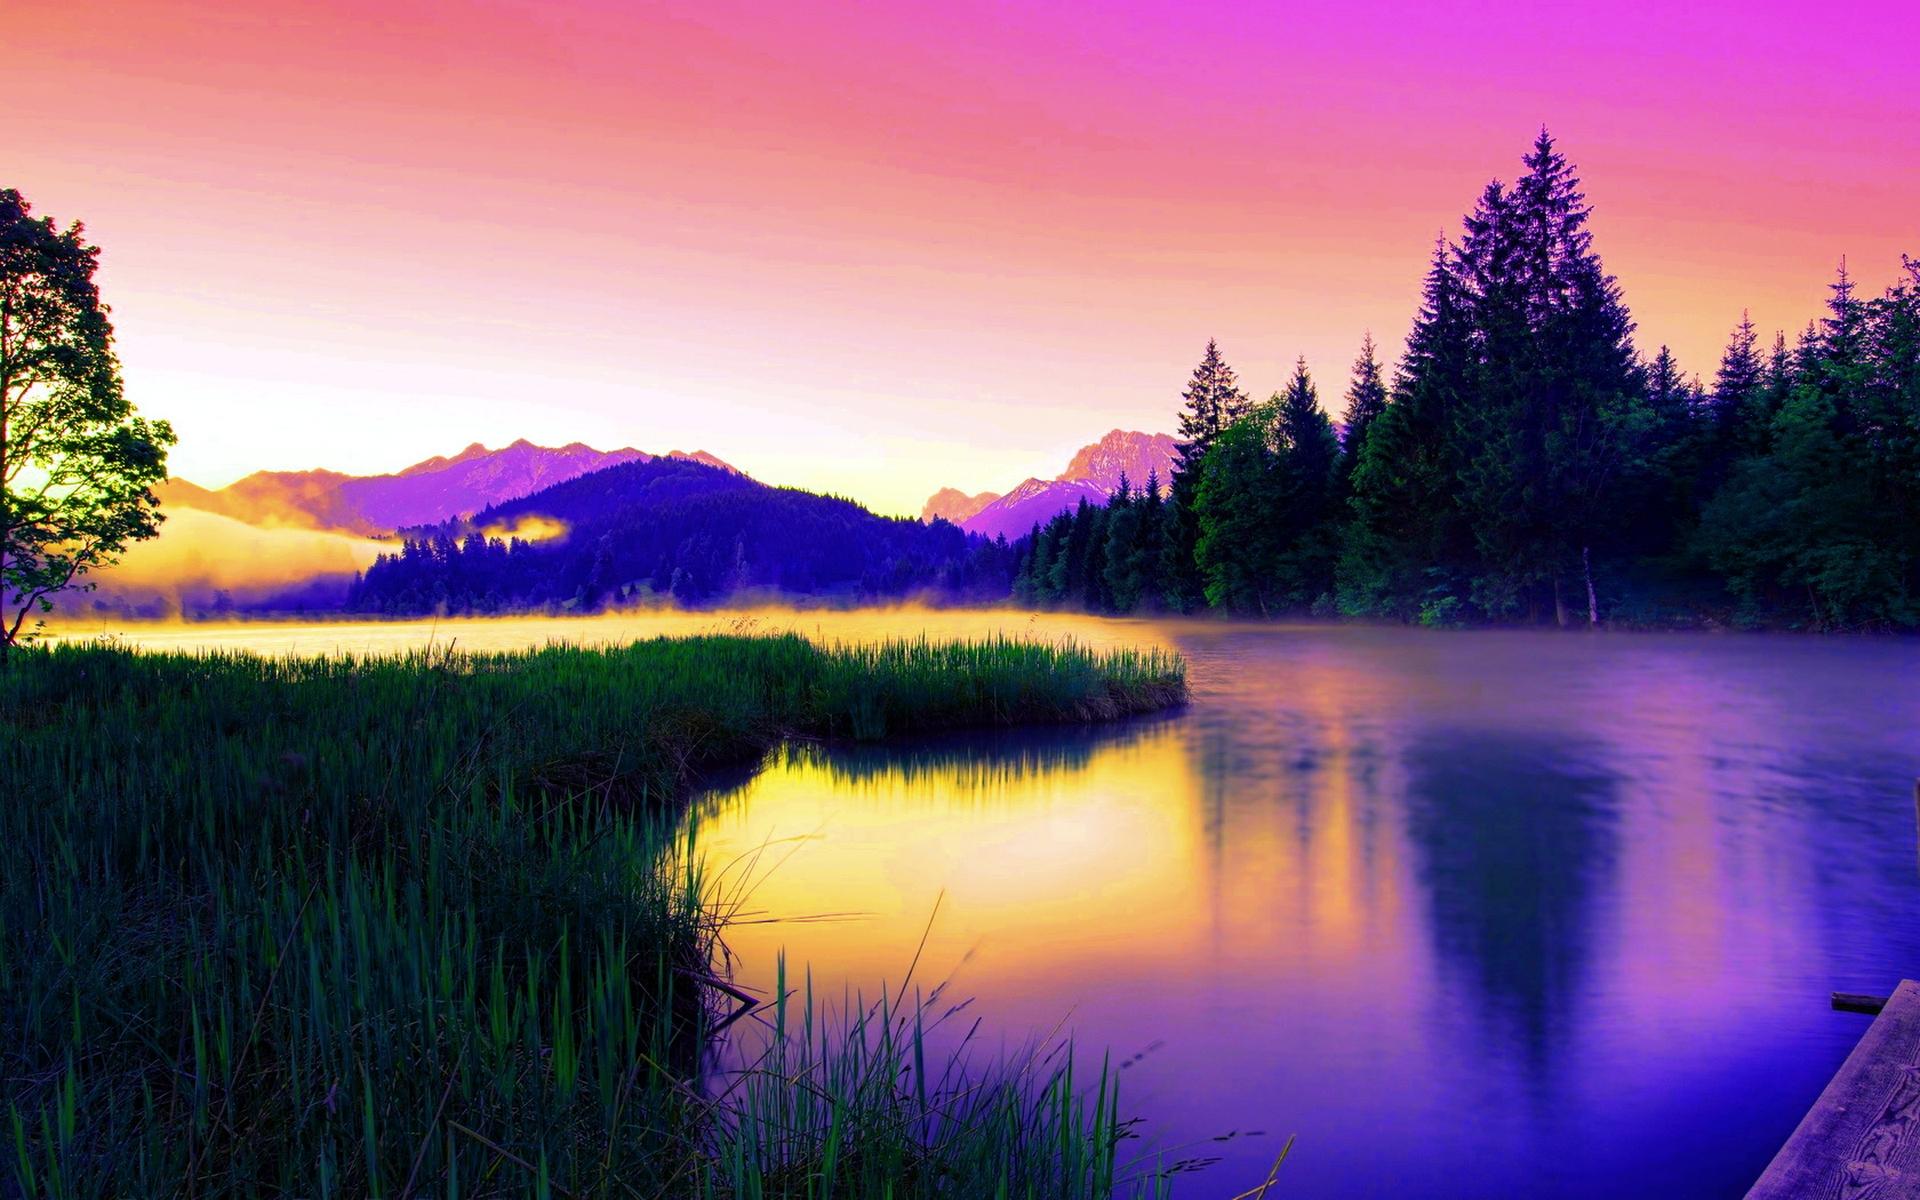 Zedge 3d Live Wallpaper Lake Wallpaper Splendid Hd Desktop Wallpapers 4k Hd